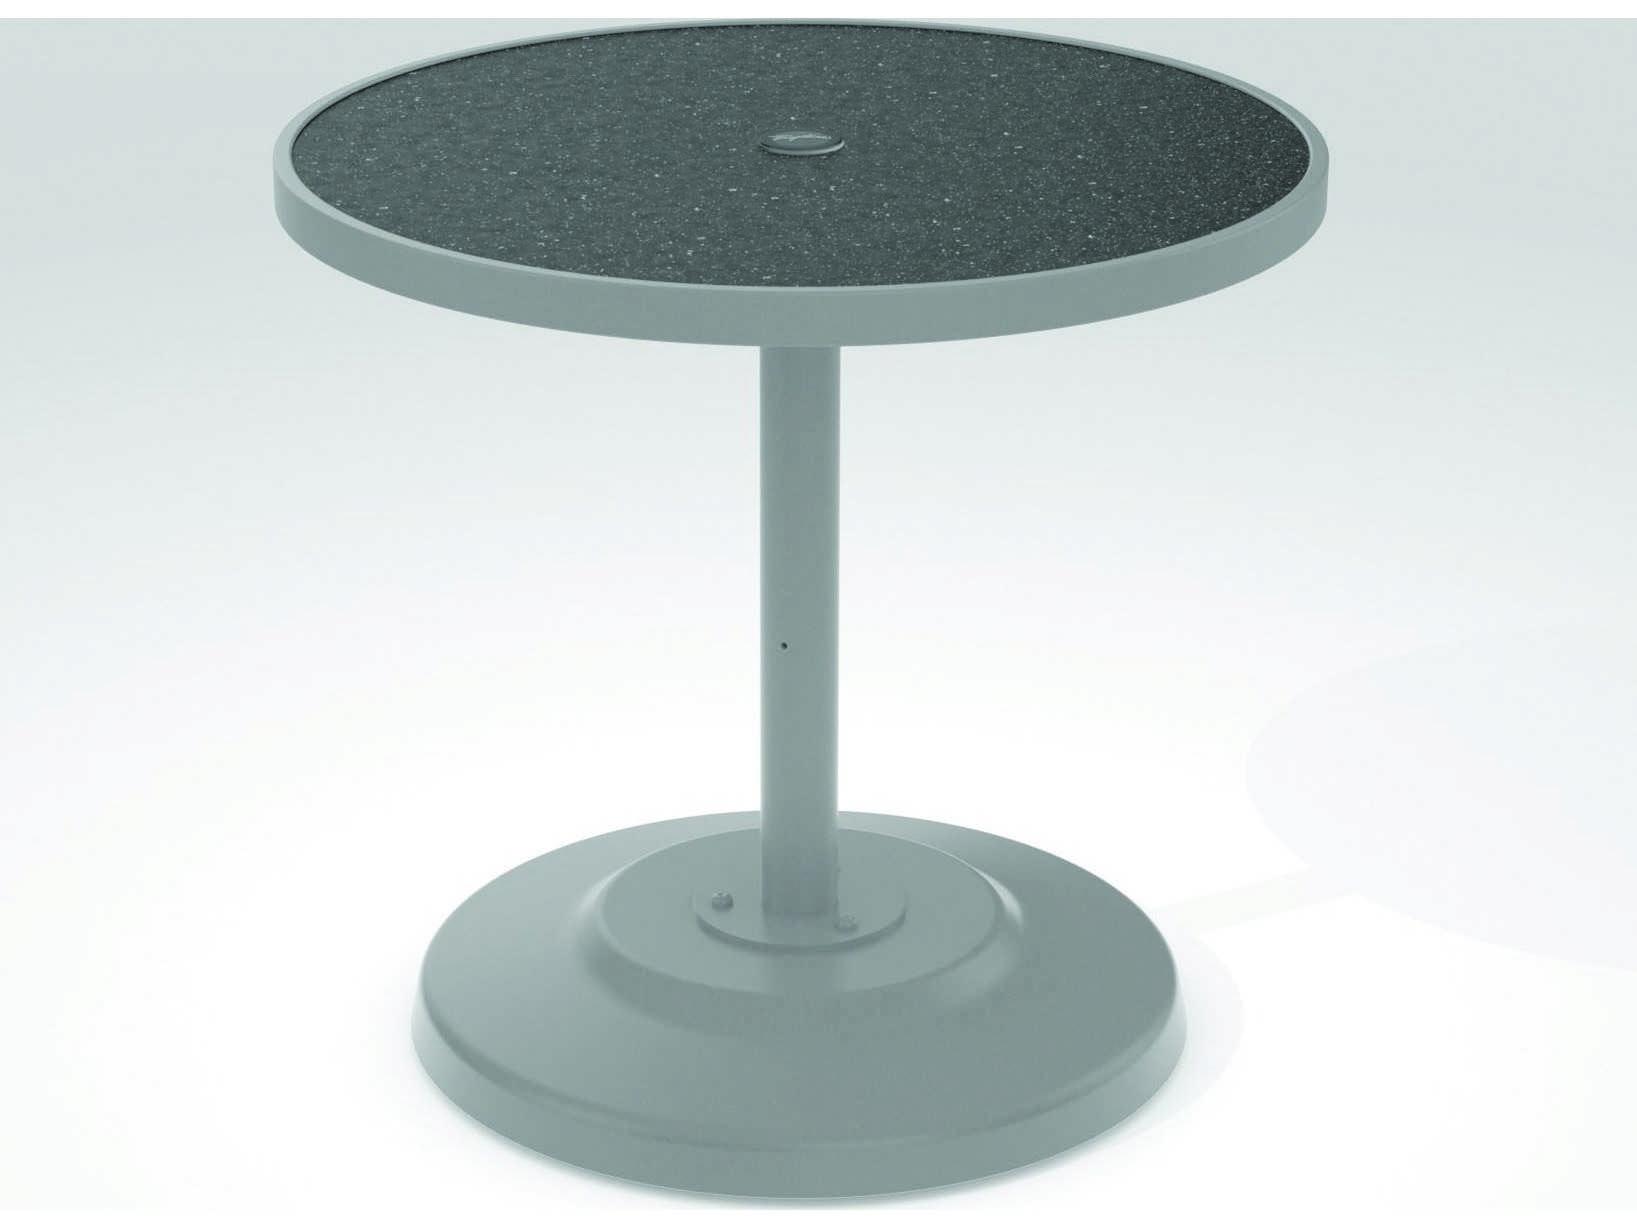 Tropitone Hpl Raduno Aluminum 30 Round Kd Pedestal Dining Umbrella Table Tp701441hu